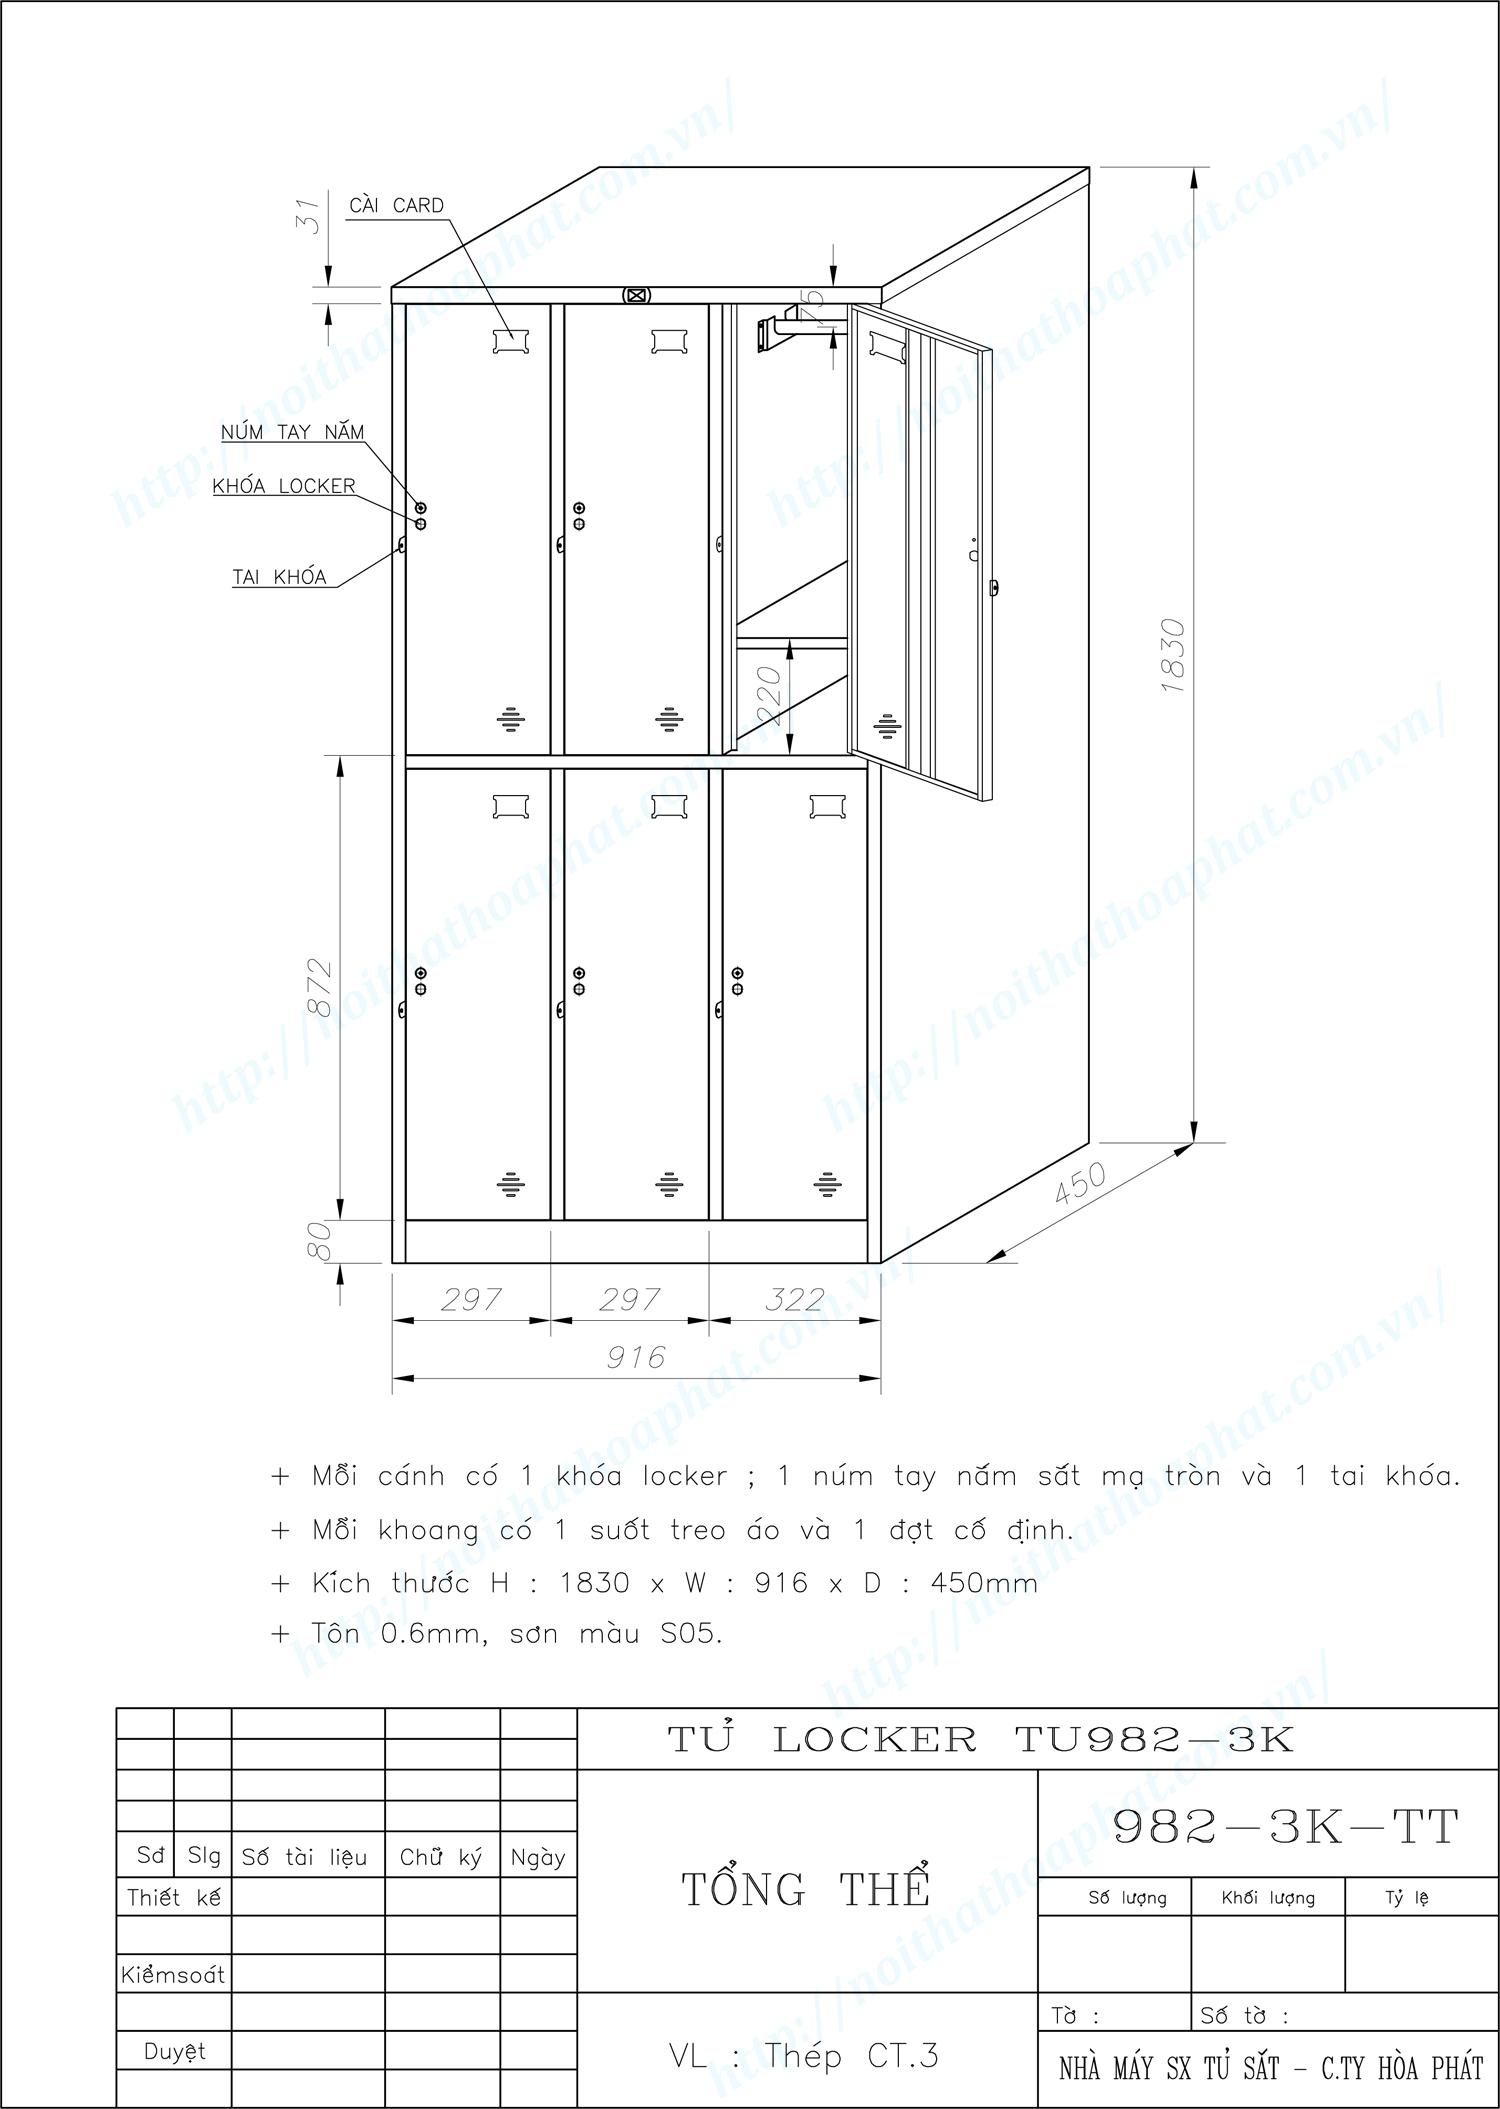 Bản vẽ kỹ thuật tủ locker 6 ngăn TU982-3K